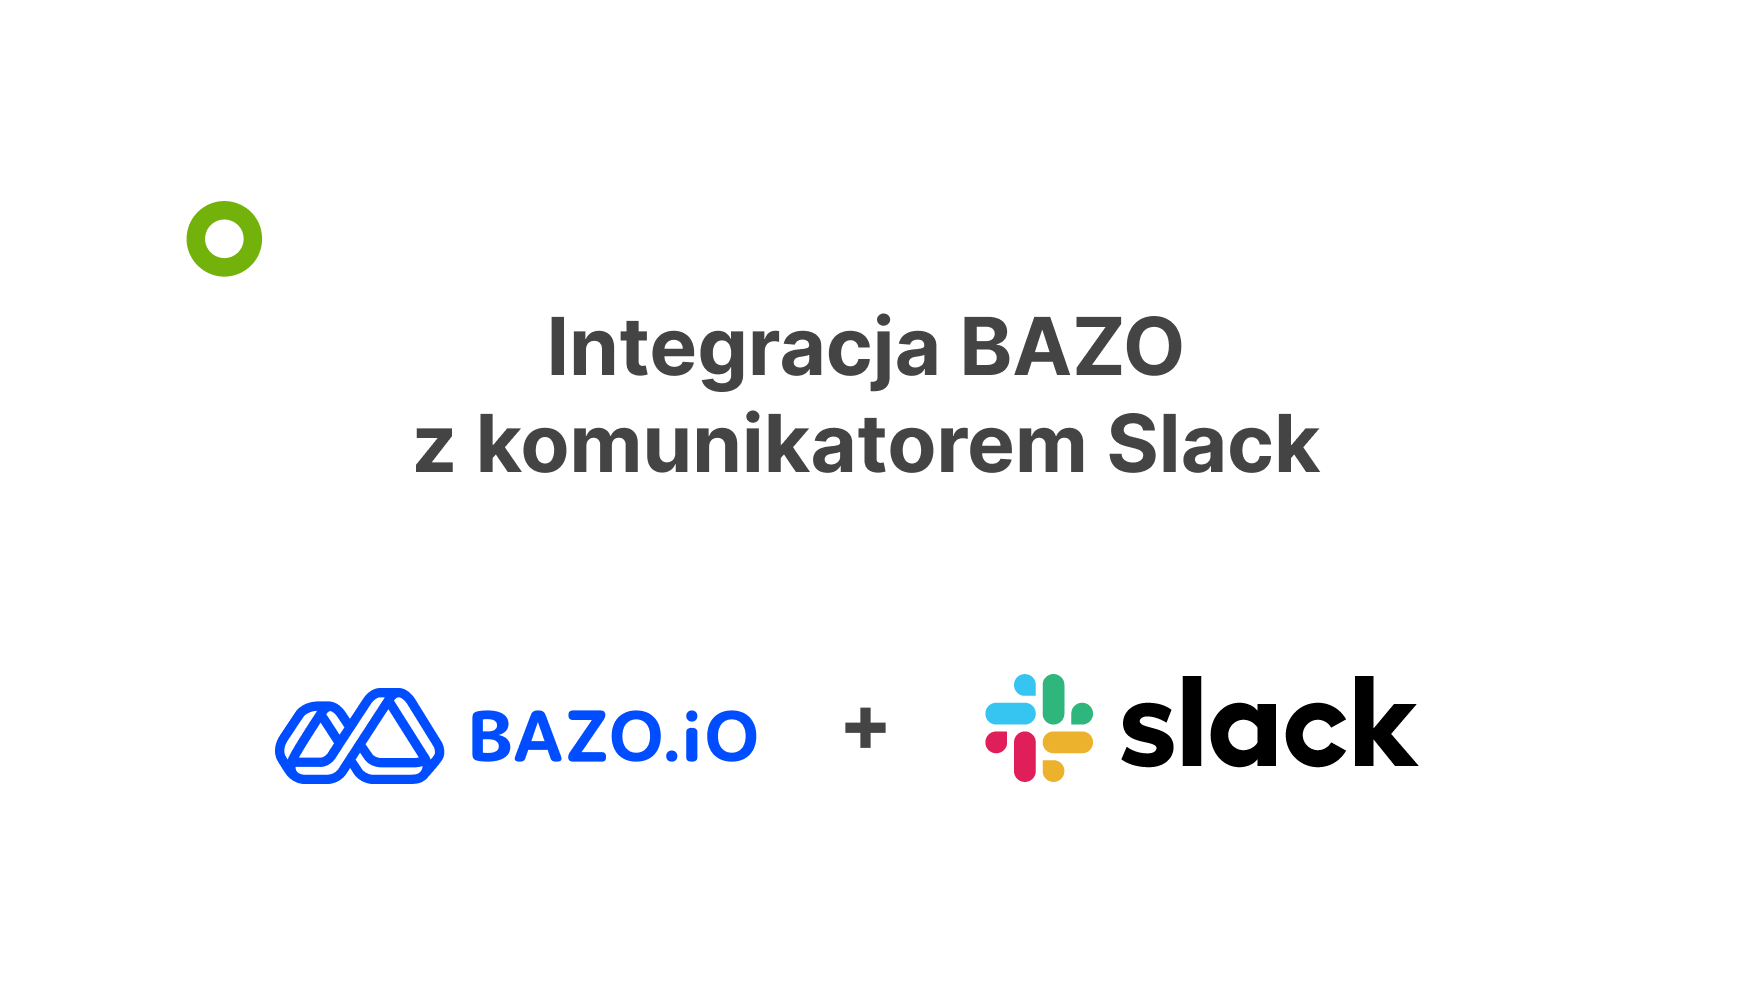 Integracja BAZO z komunikatorem Slack